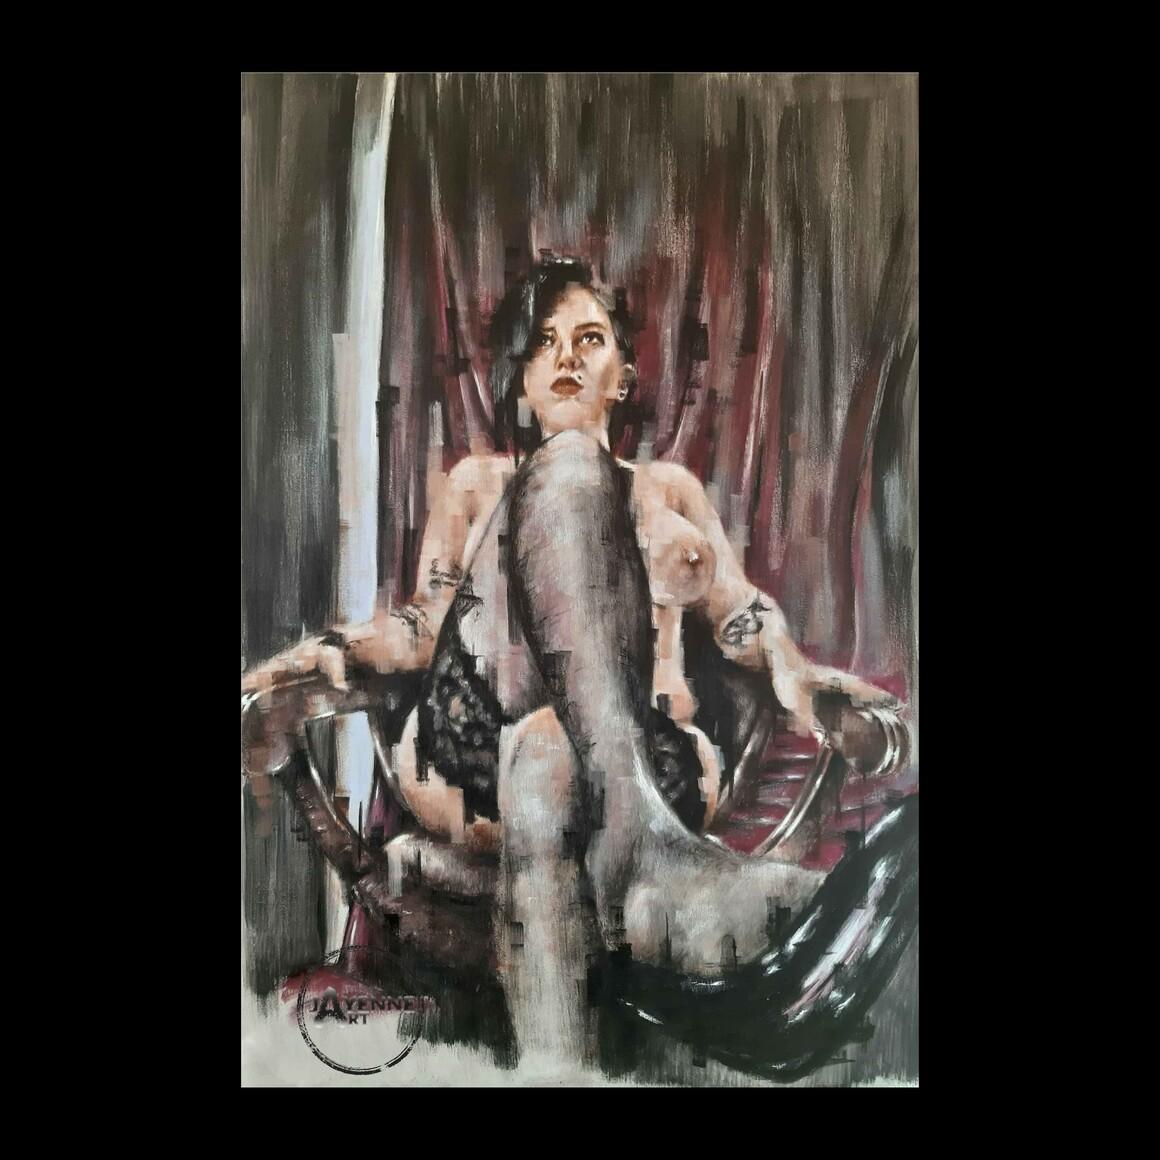 Untitled Nude #7